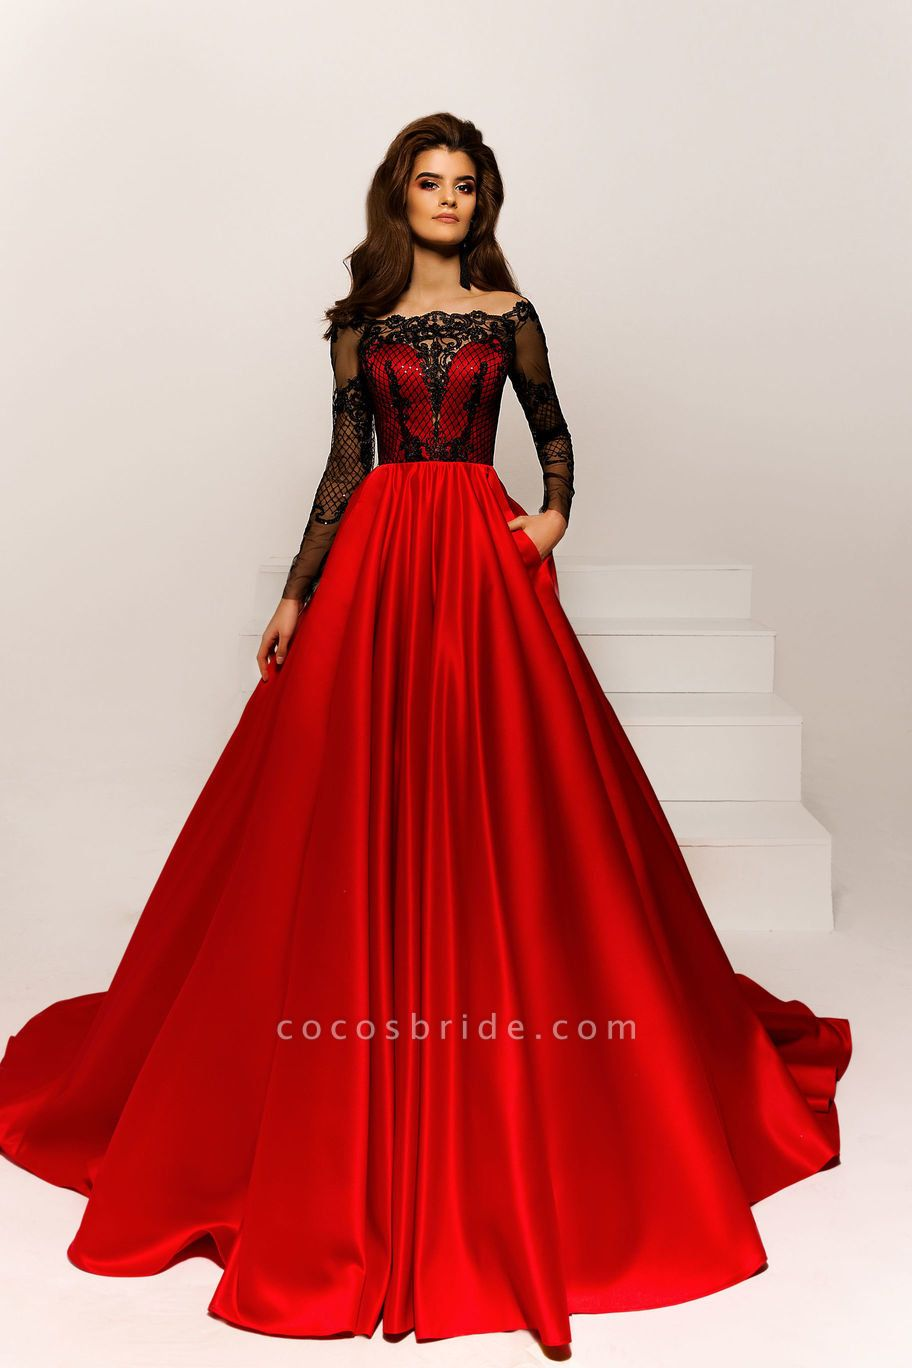 SD1923 Off The Shoulder Appliques A-line Prom Dress